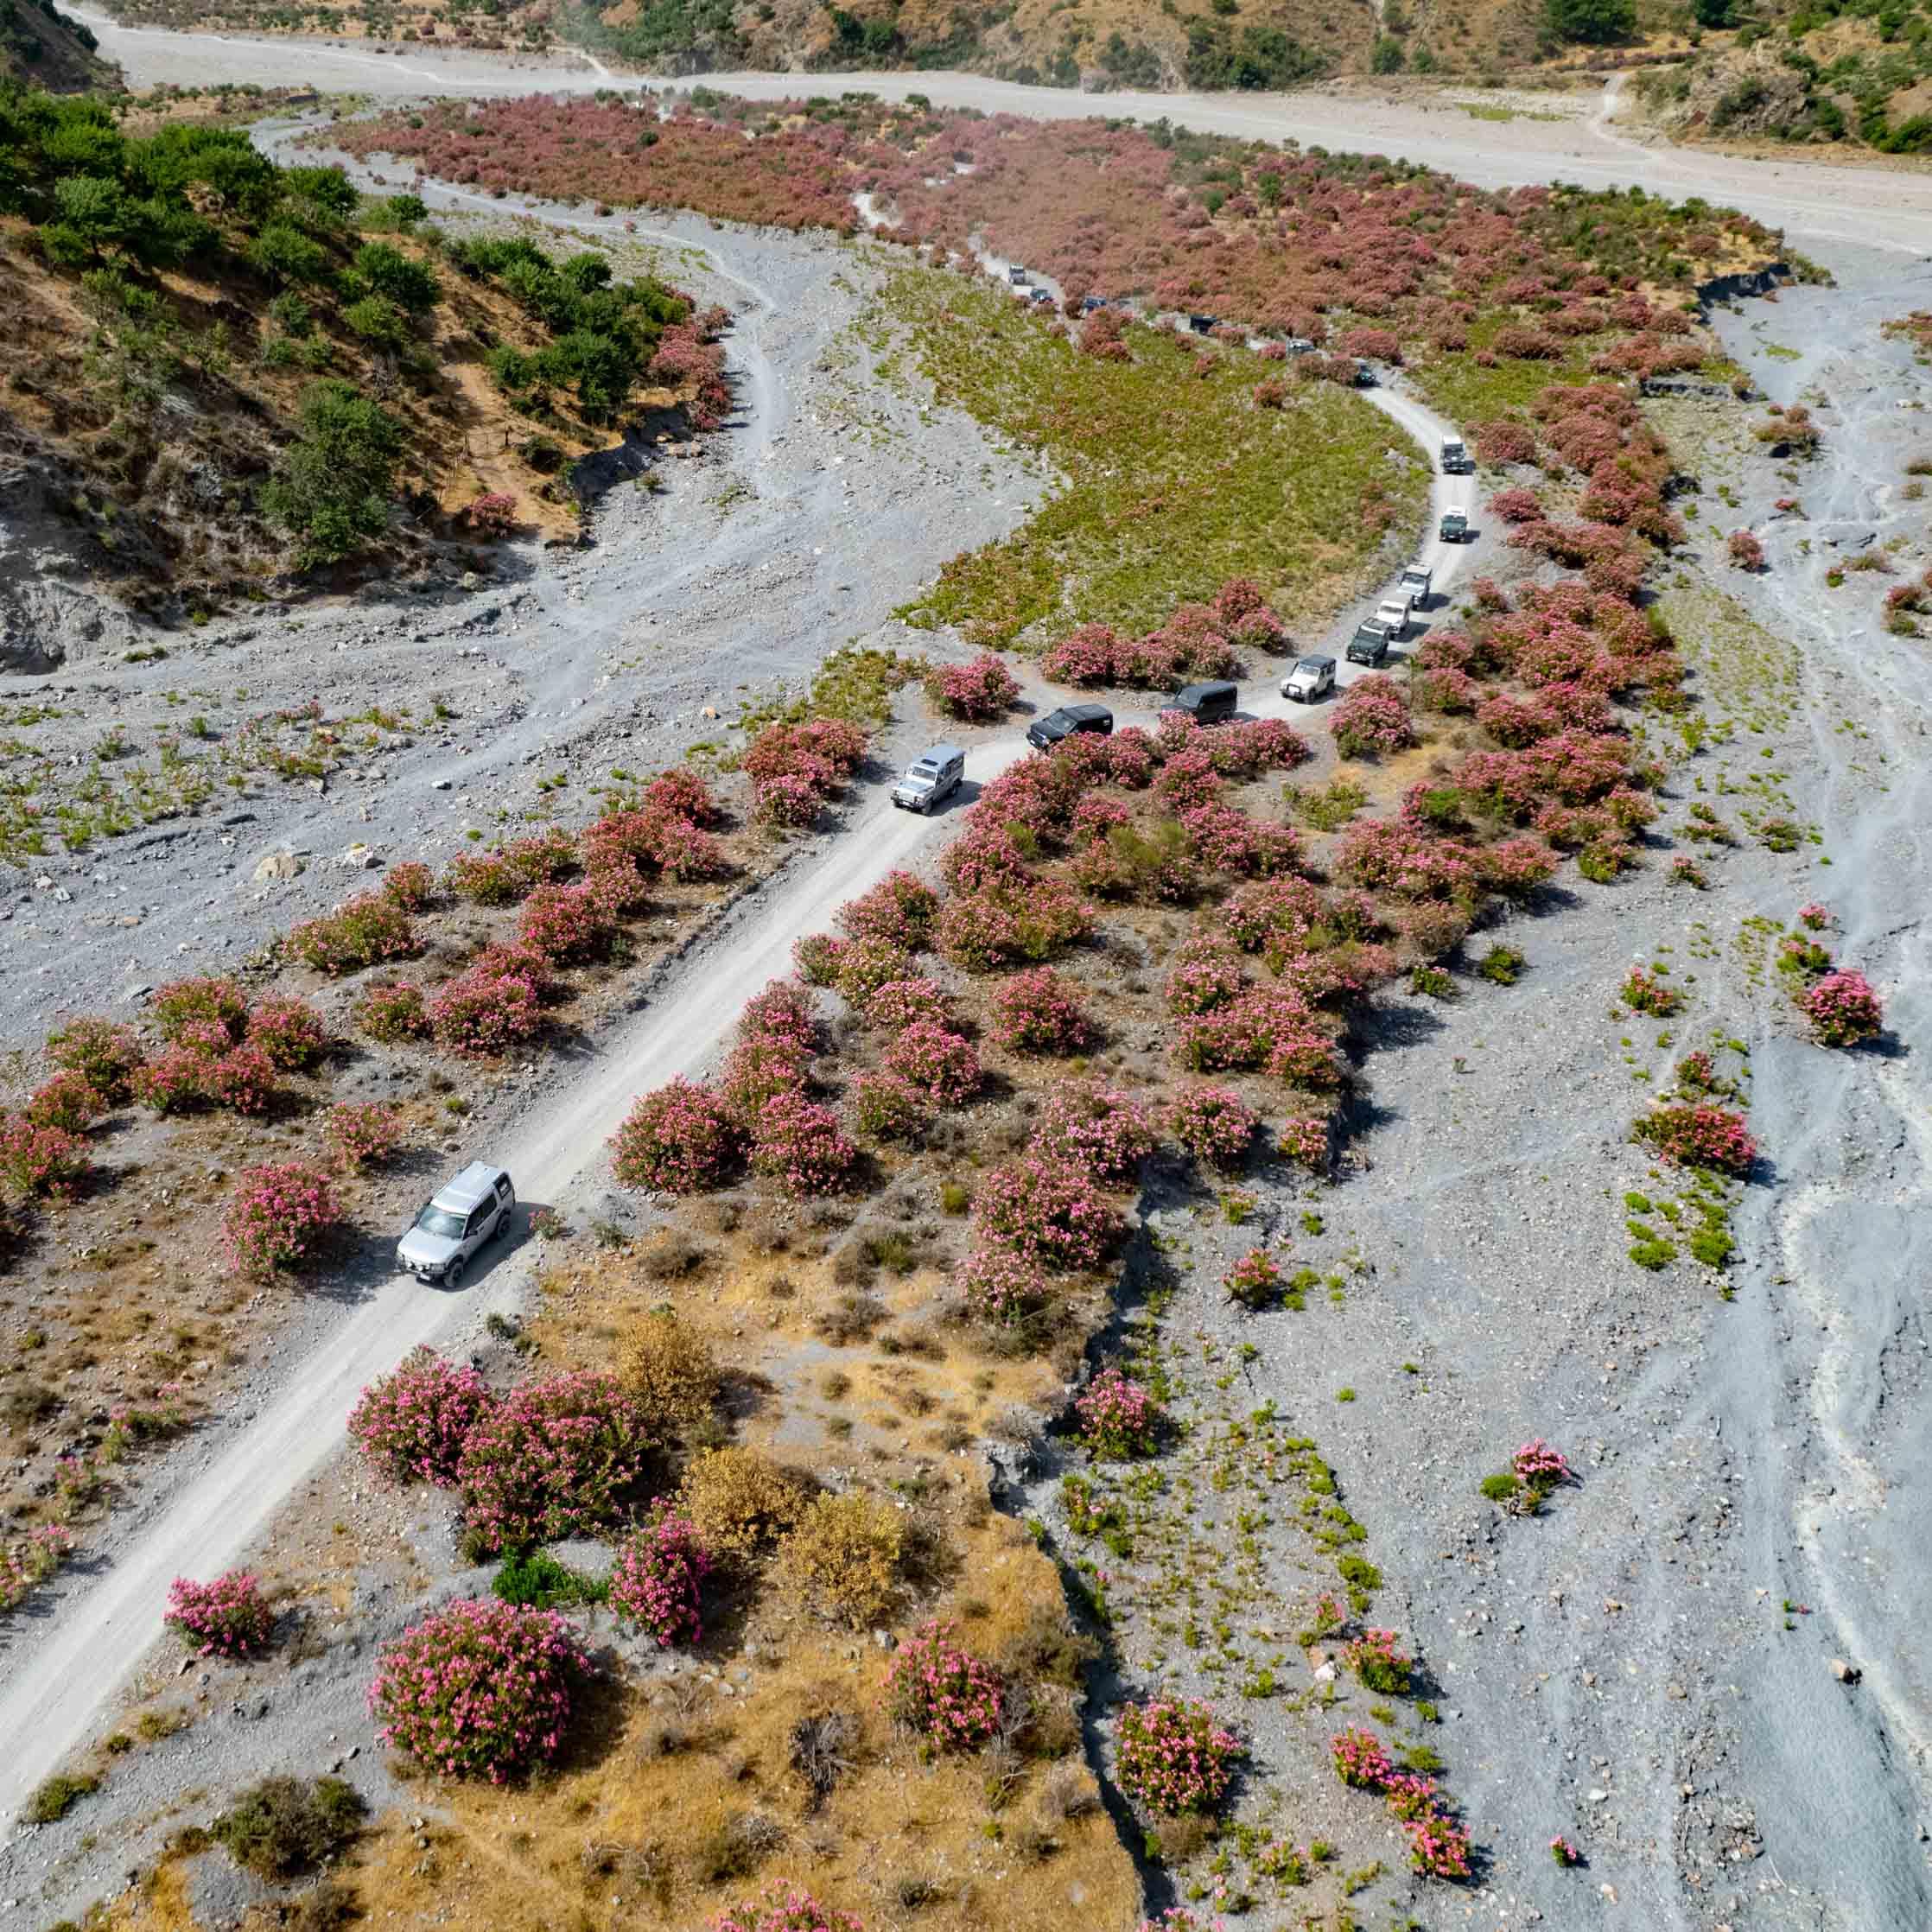 Land_Rover_Tour_Sicilia_2021_Land_Rover_Experience_Italia_-10